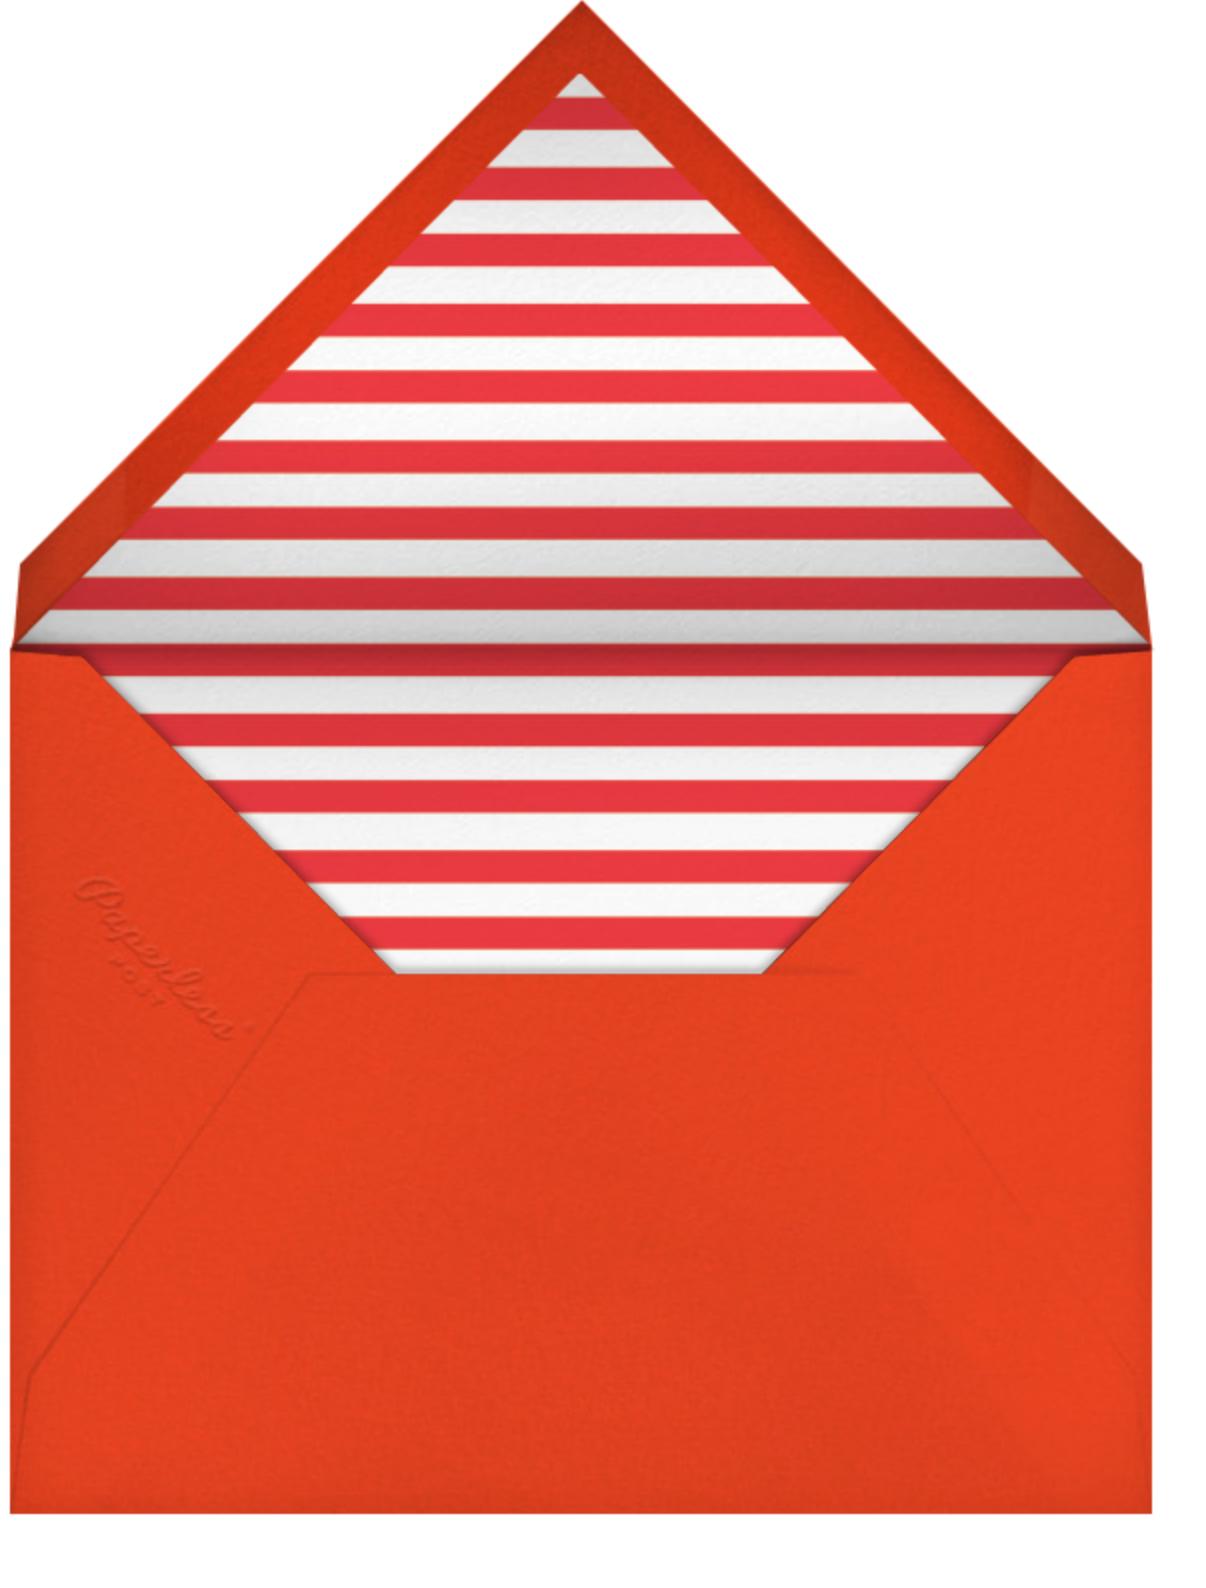 Give Thanks - kate spade new york - null - envelope back